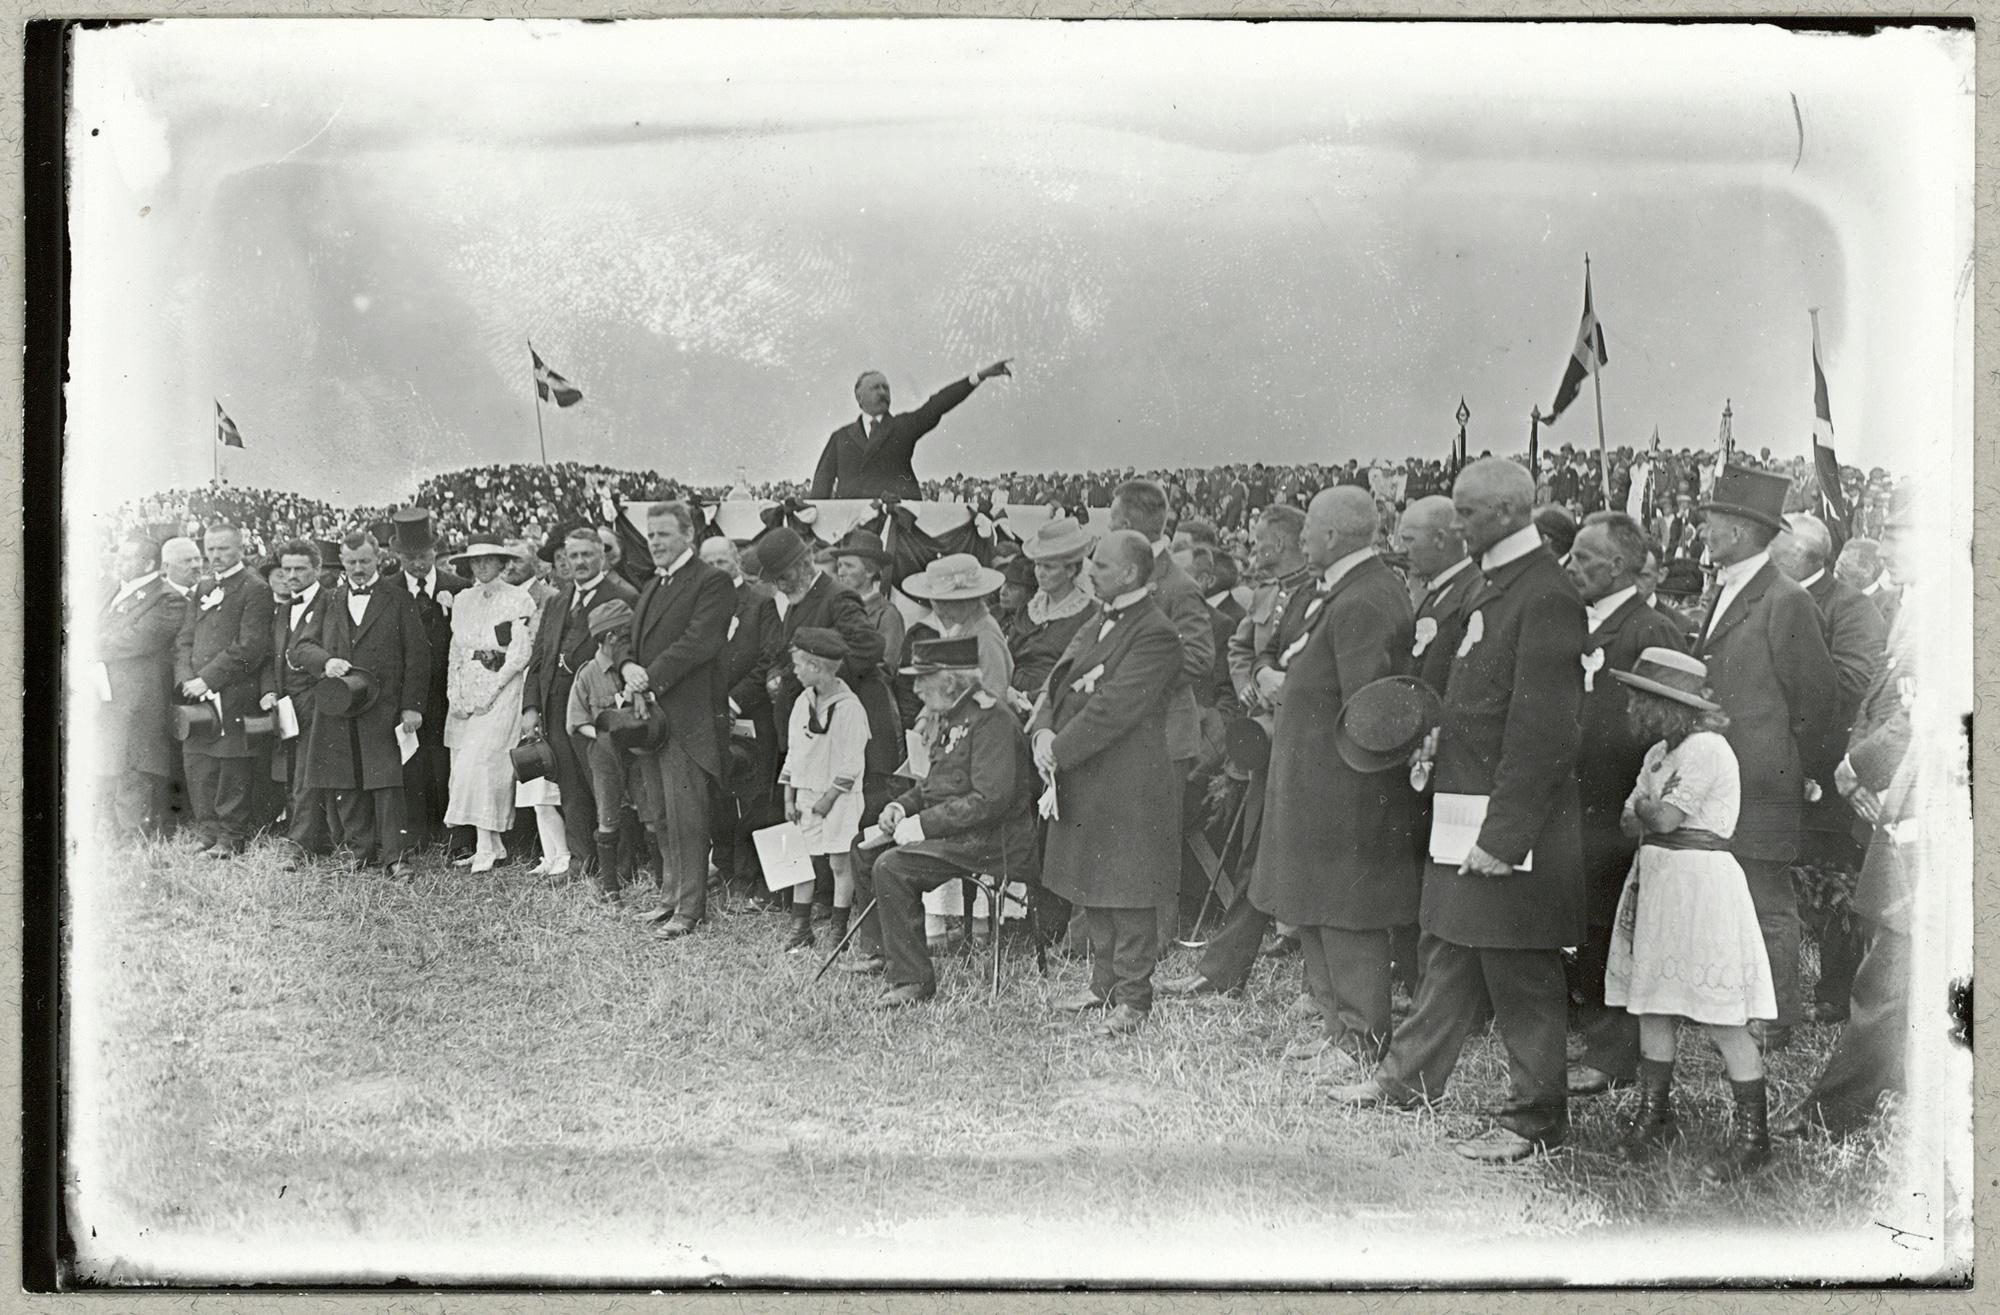 H P Hanssen speaks at a Reunification celebration